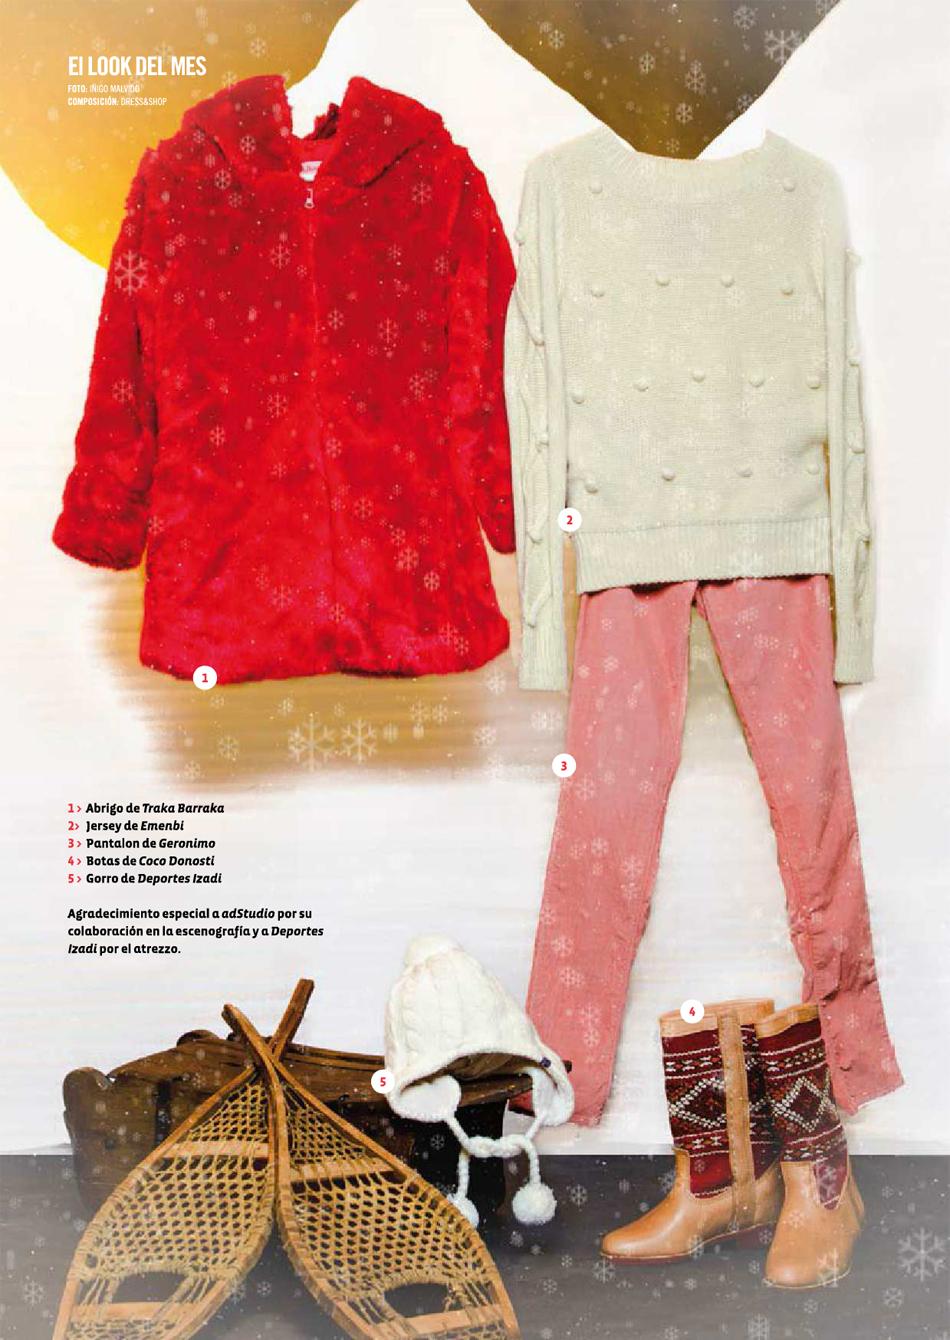 943 Magazine / Look de febrero